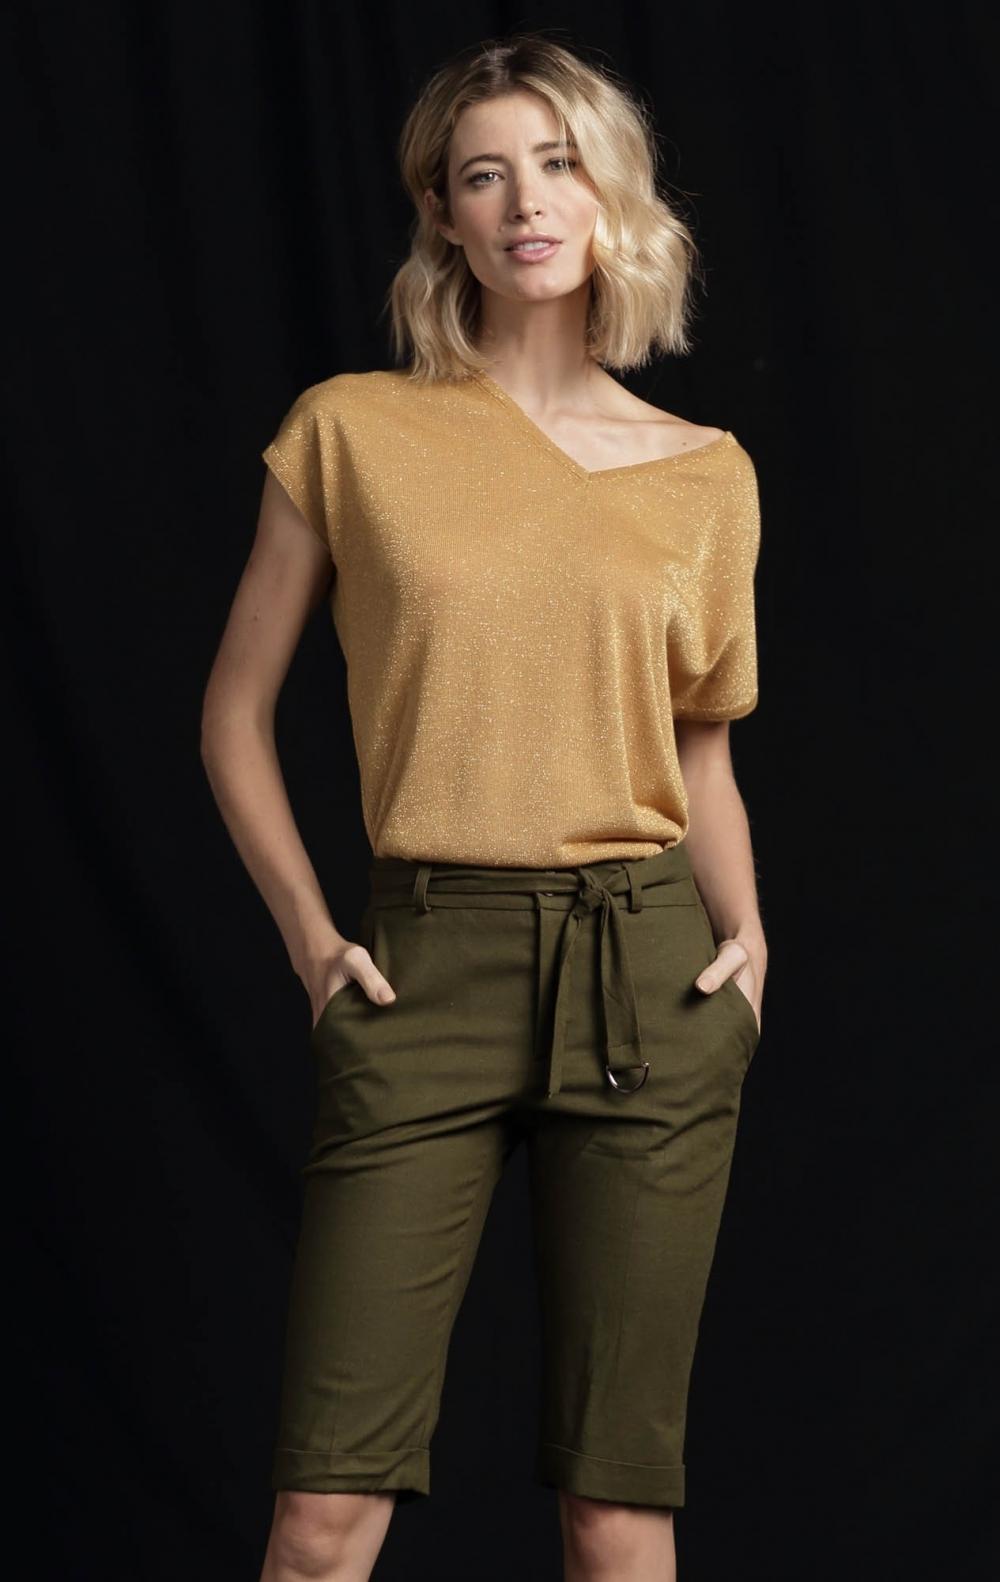 Blusa Lurex Dourada - Foto 1